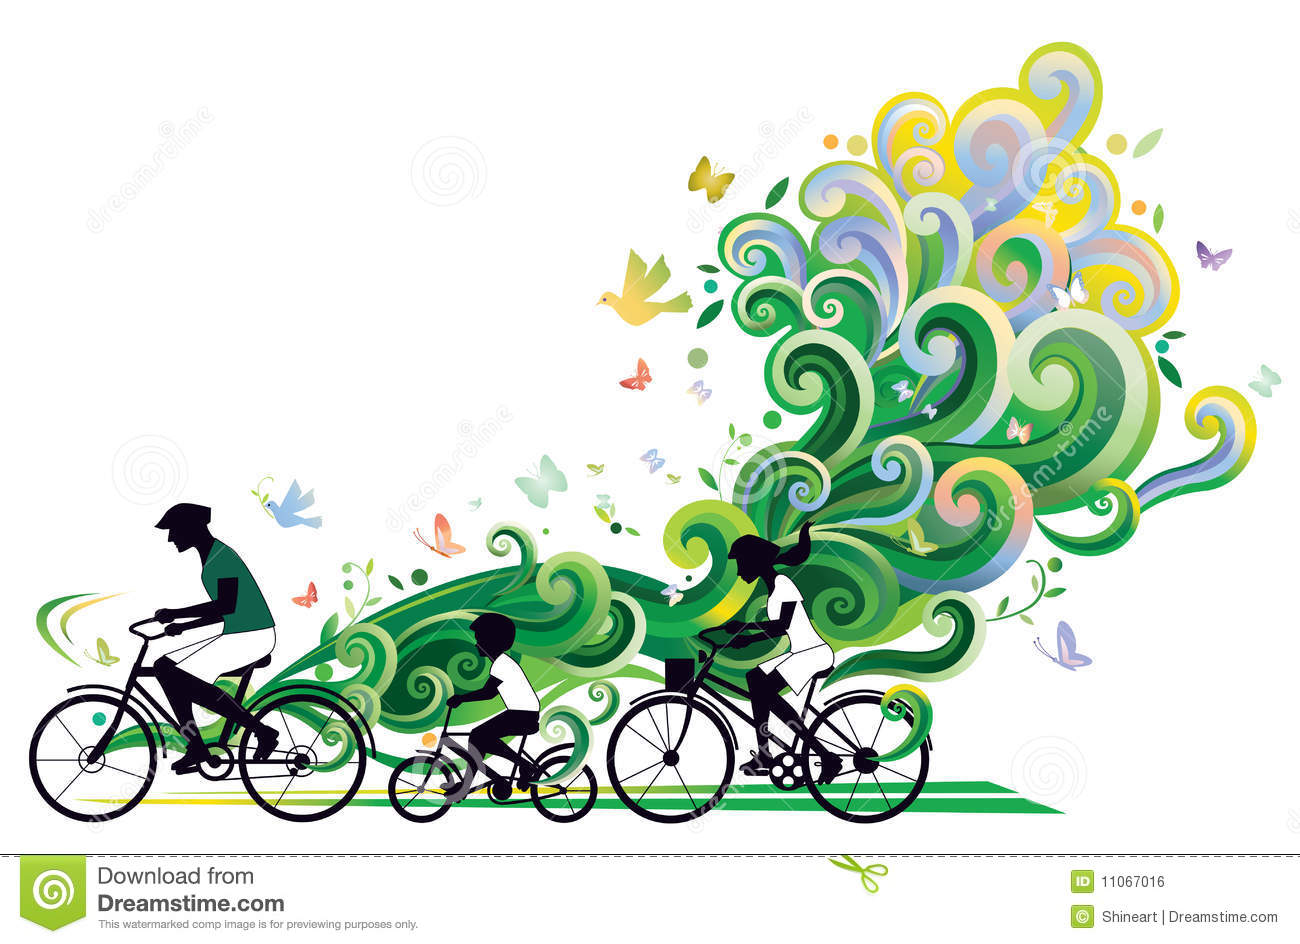 Family bike ride clipart.